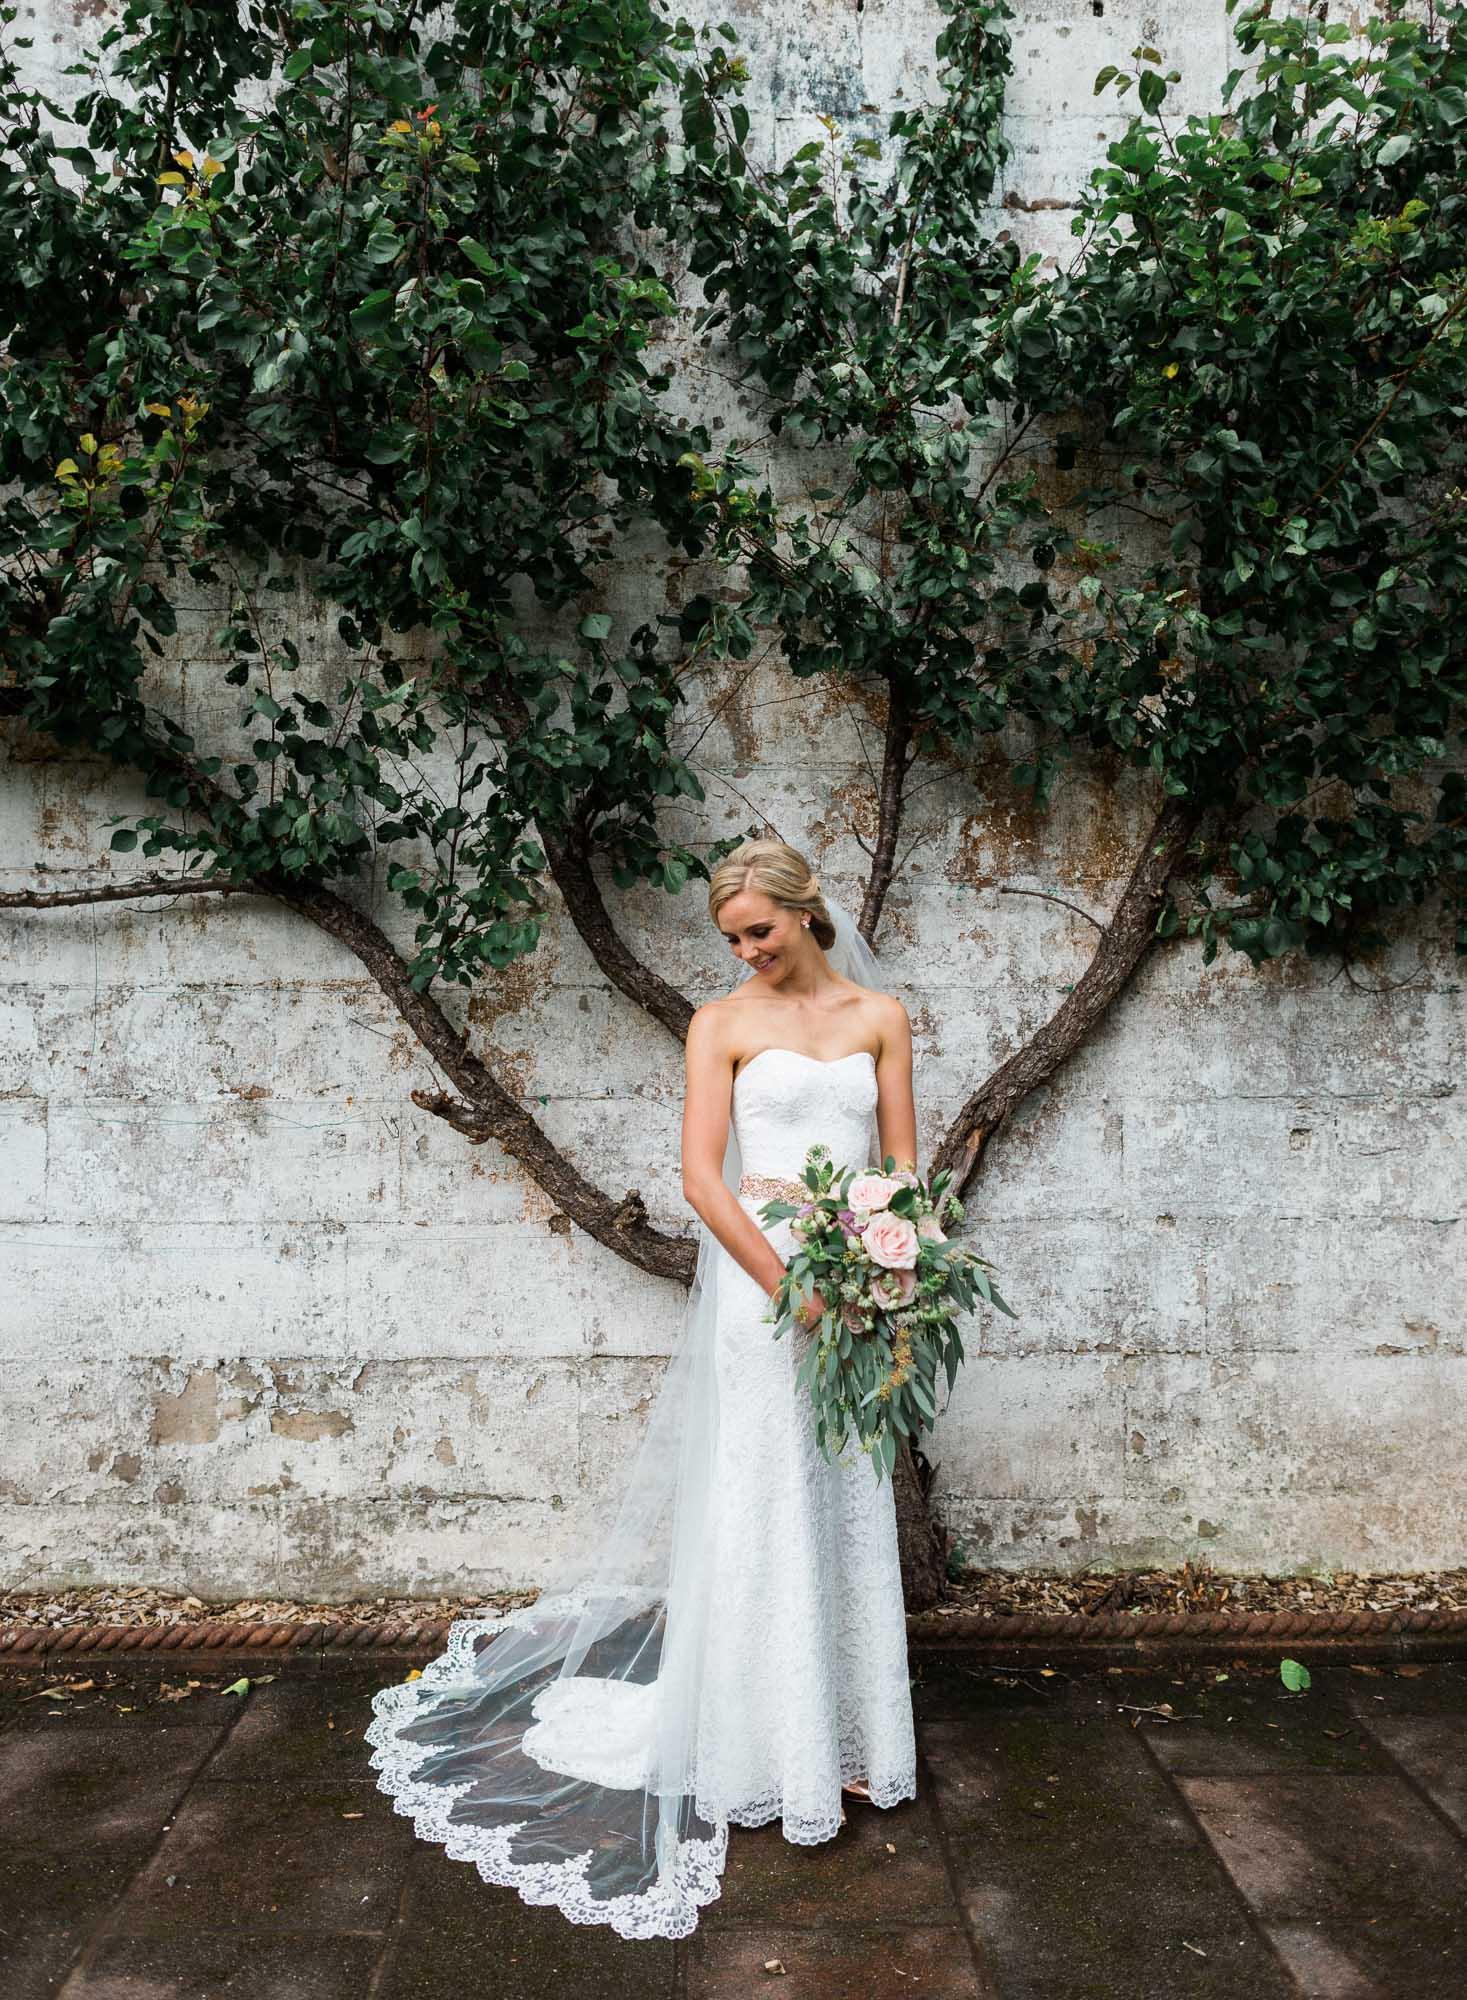 scottish_wedding_blairquhan_castle-54.jpg